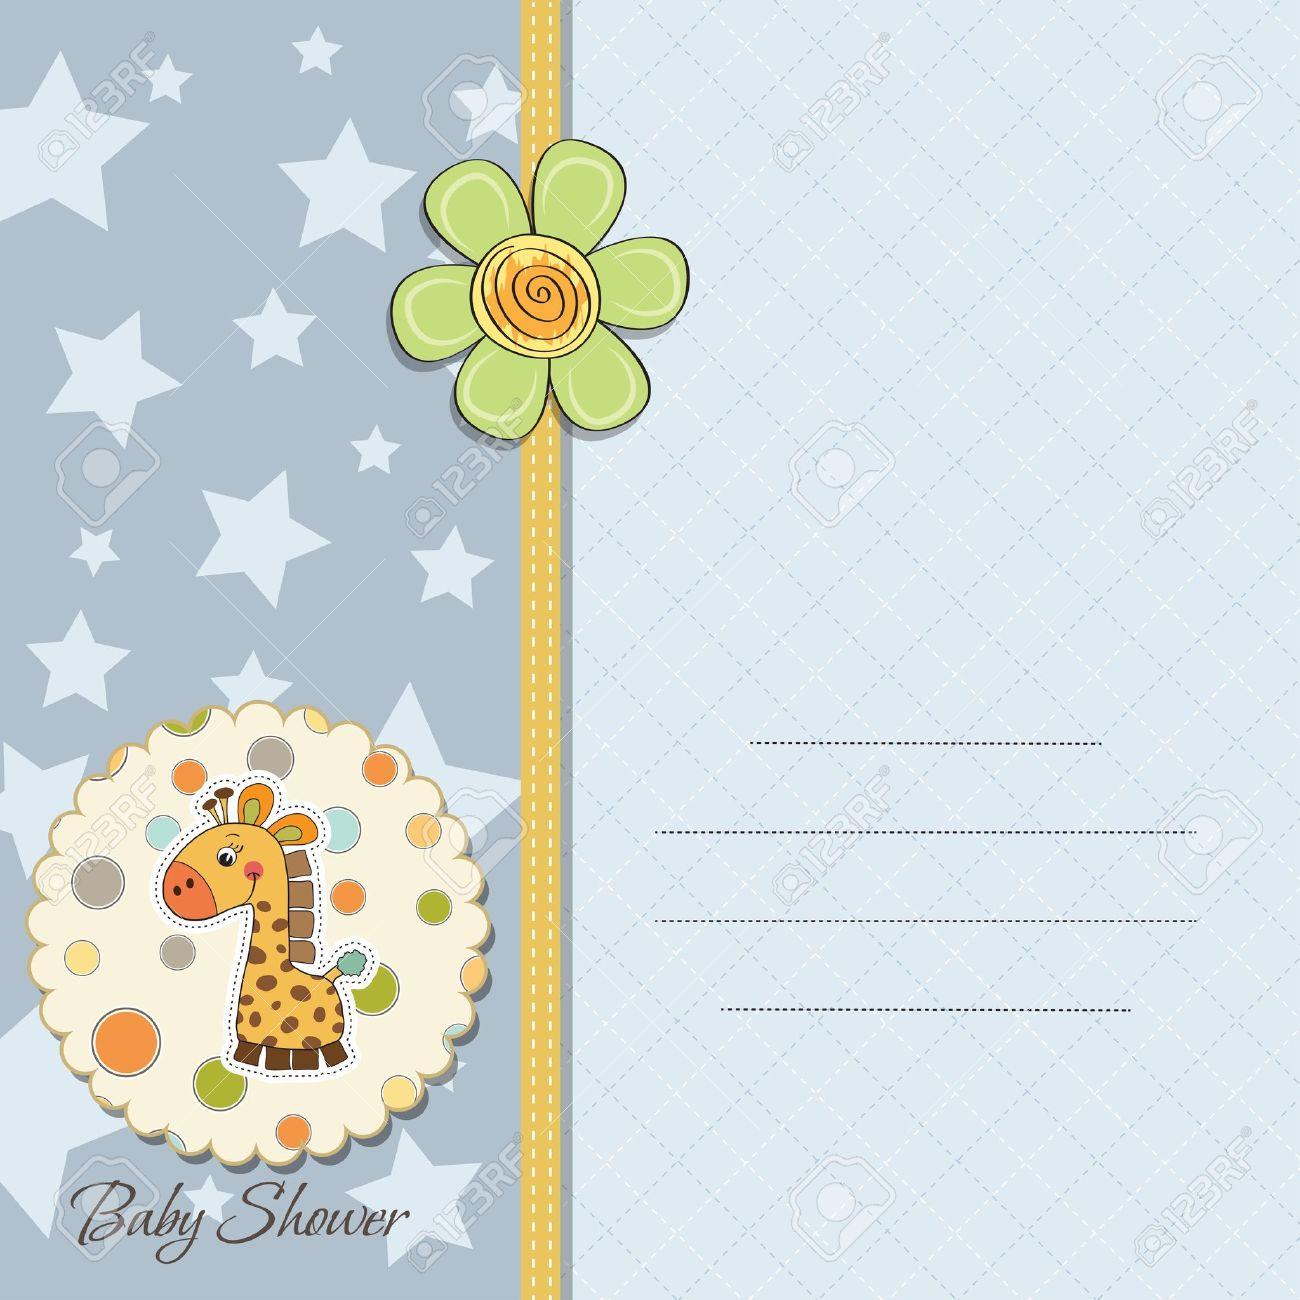 new baby boy announcement card with giraffe Stock Vector - 14169139